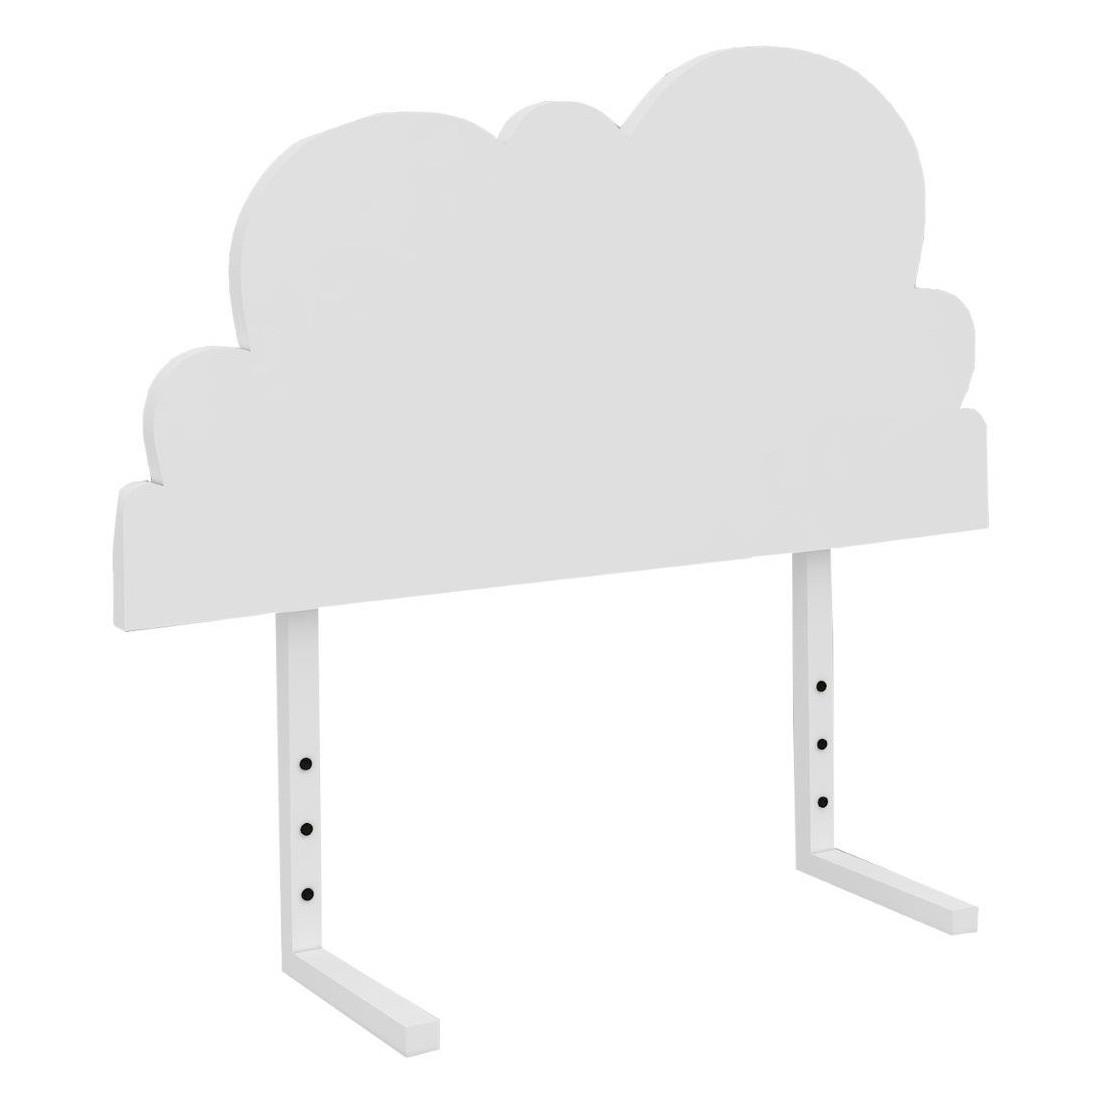 Christopher Wooden Kids Bed Headboard, Cloud, Single